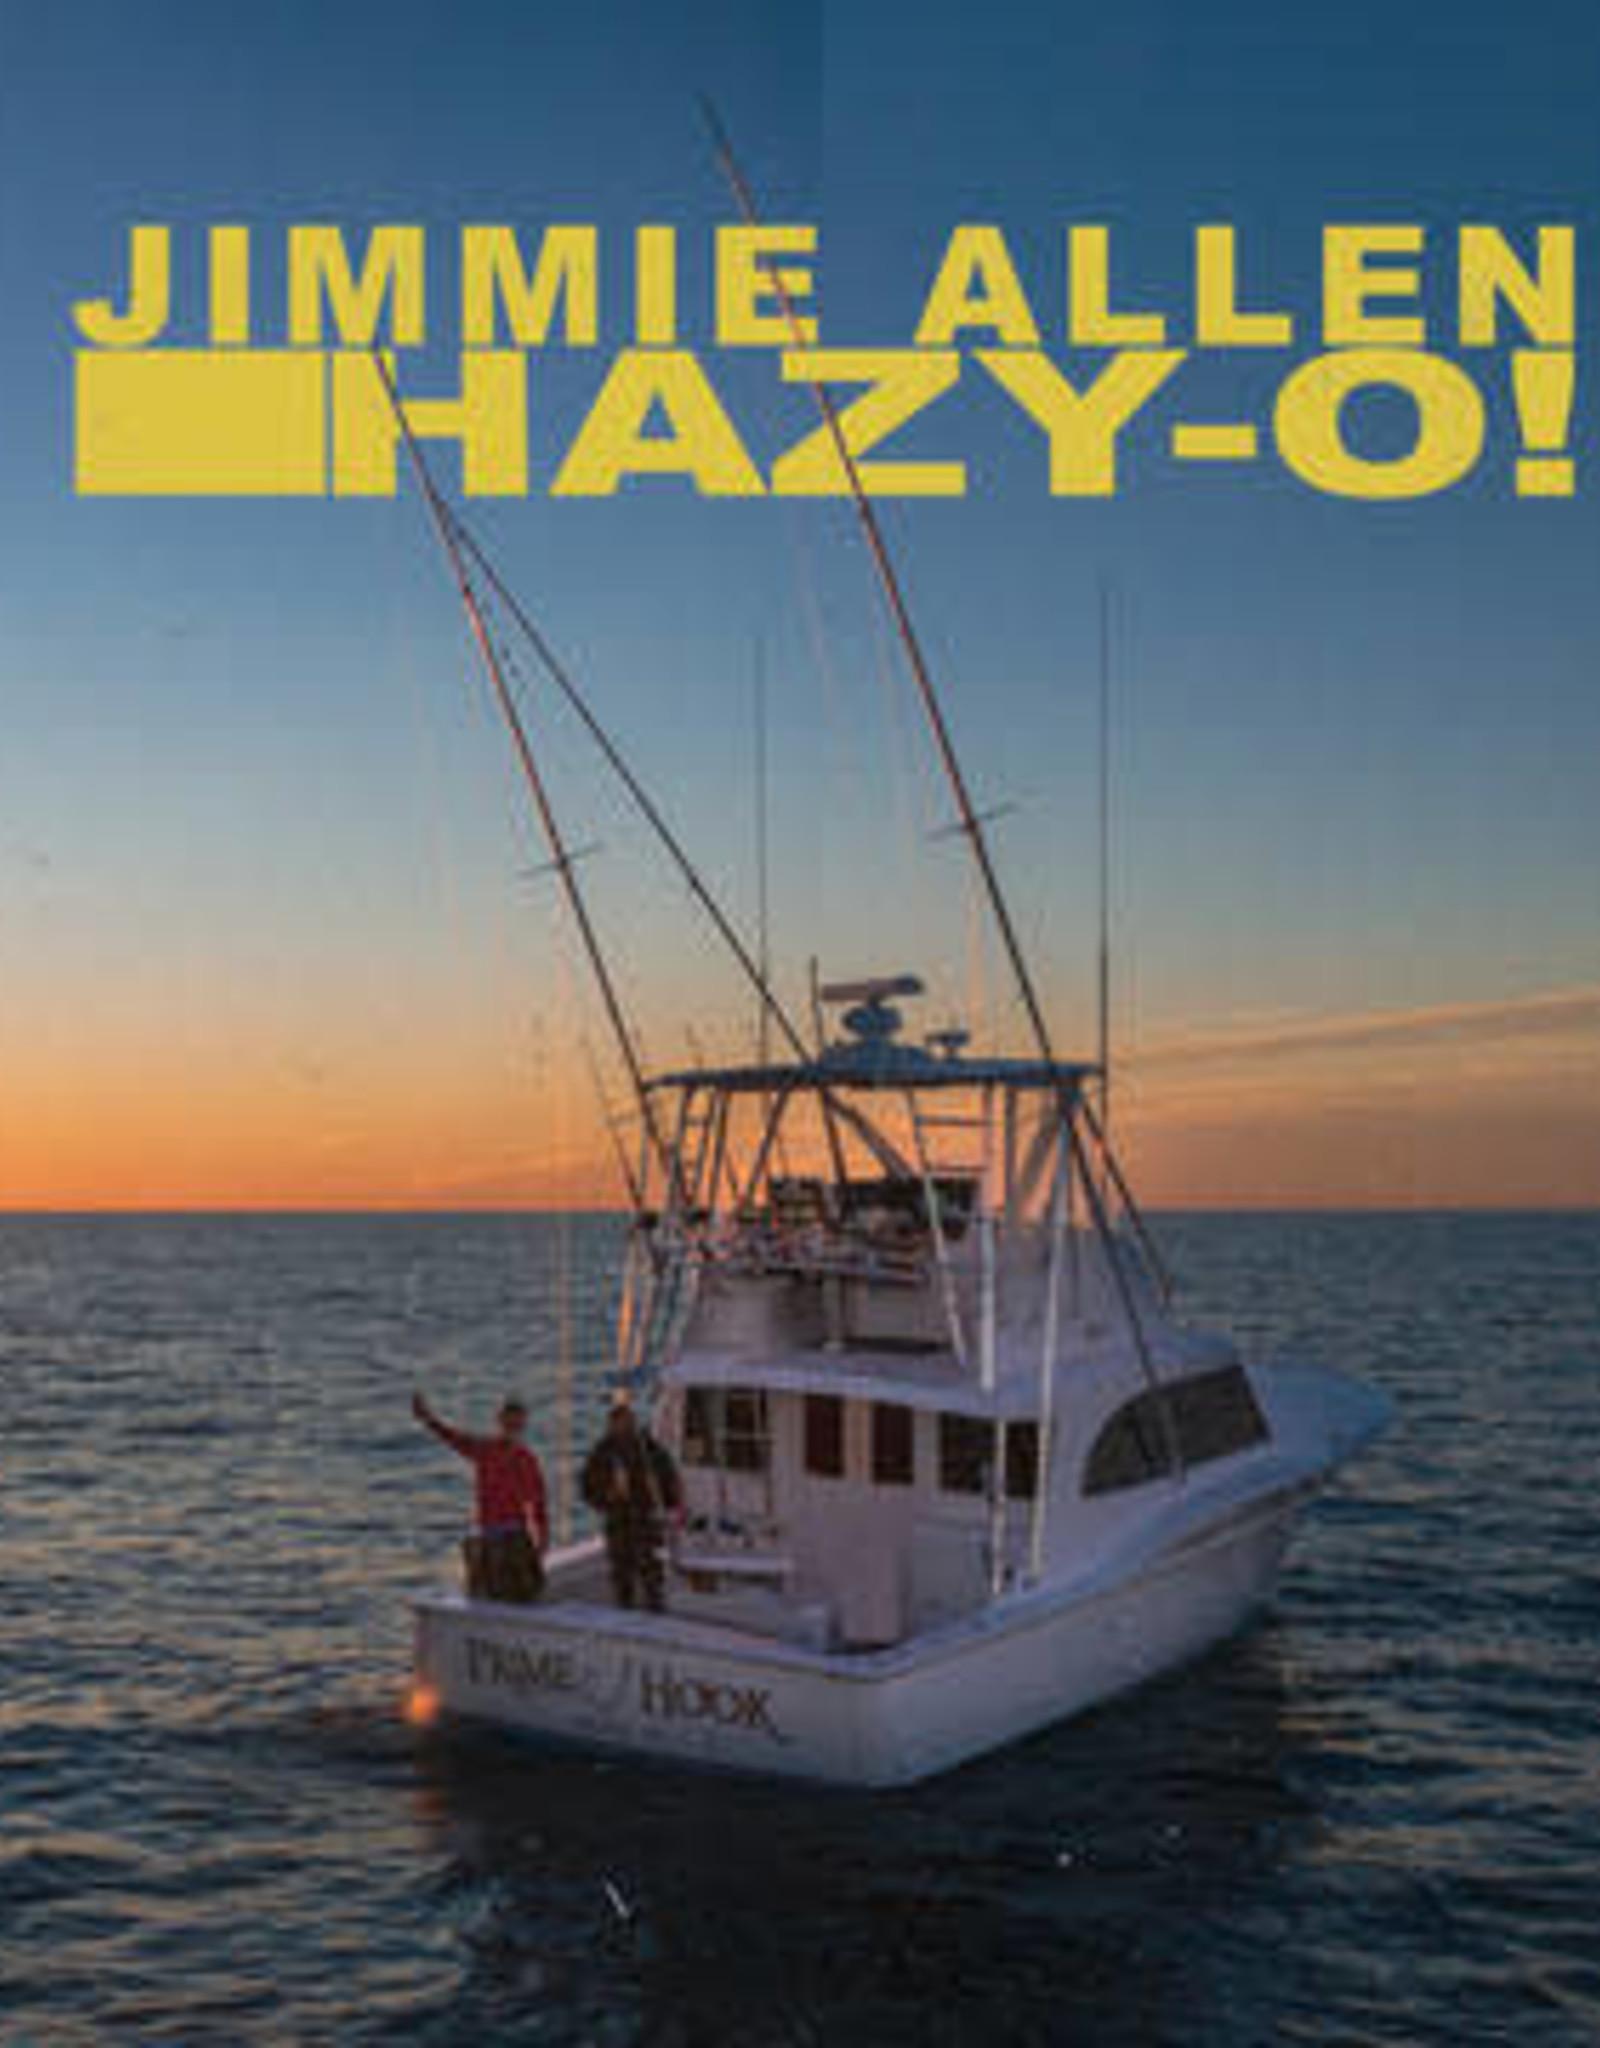 Jimmie Allen - Hazy-O! (RSD 6/21)